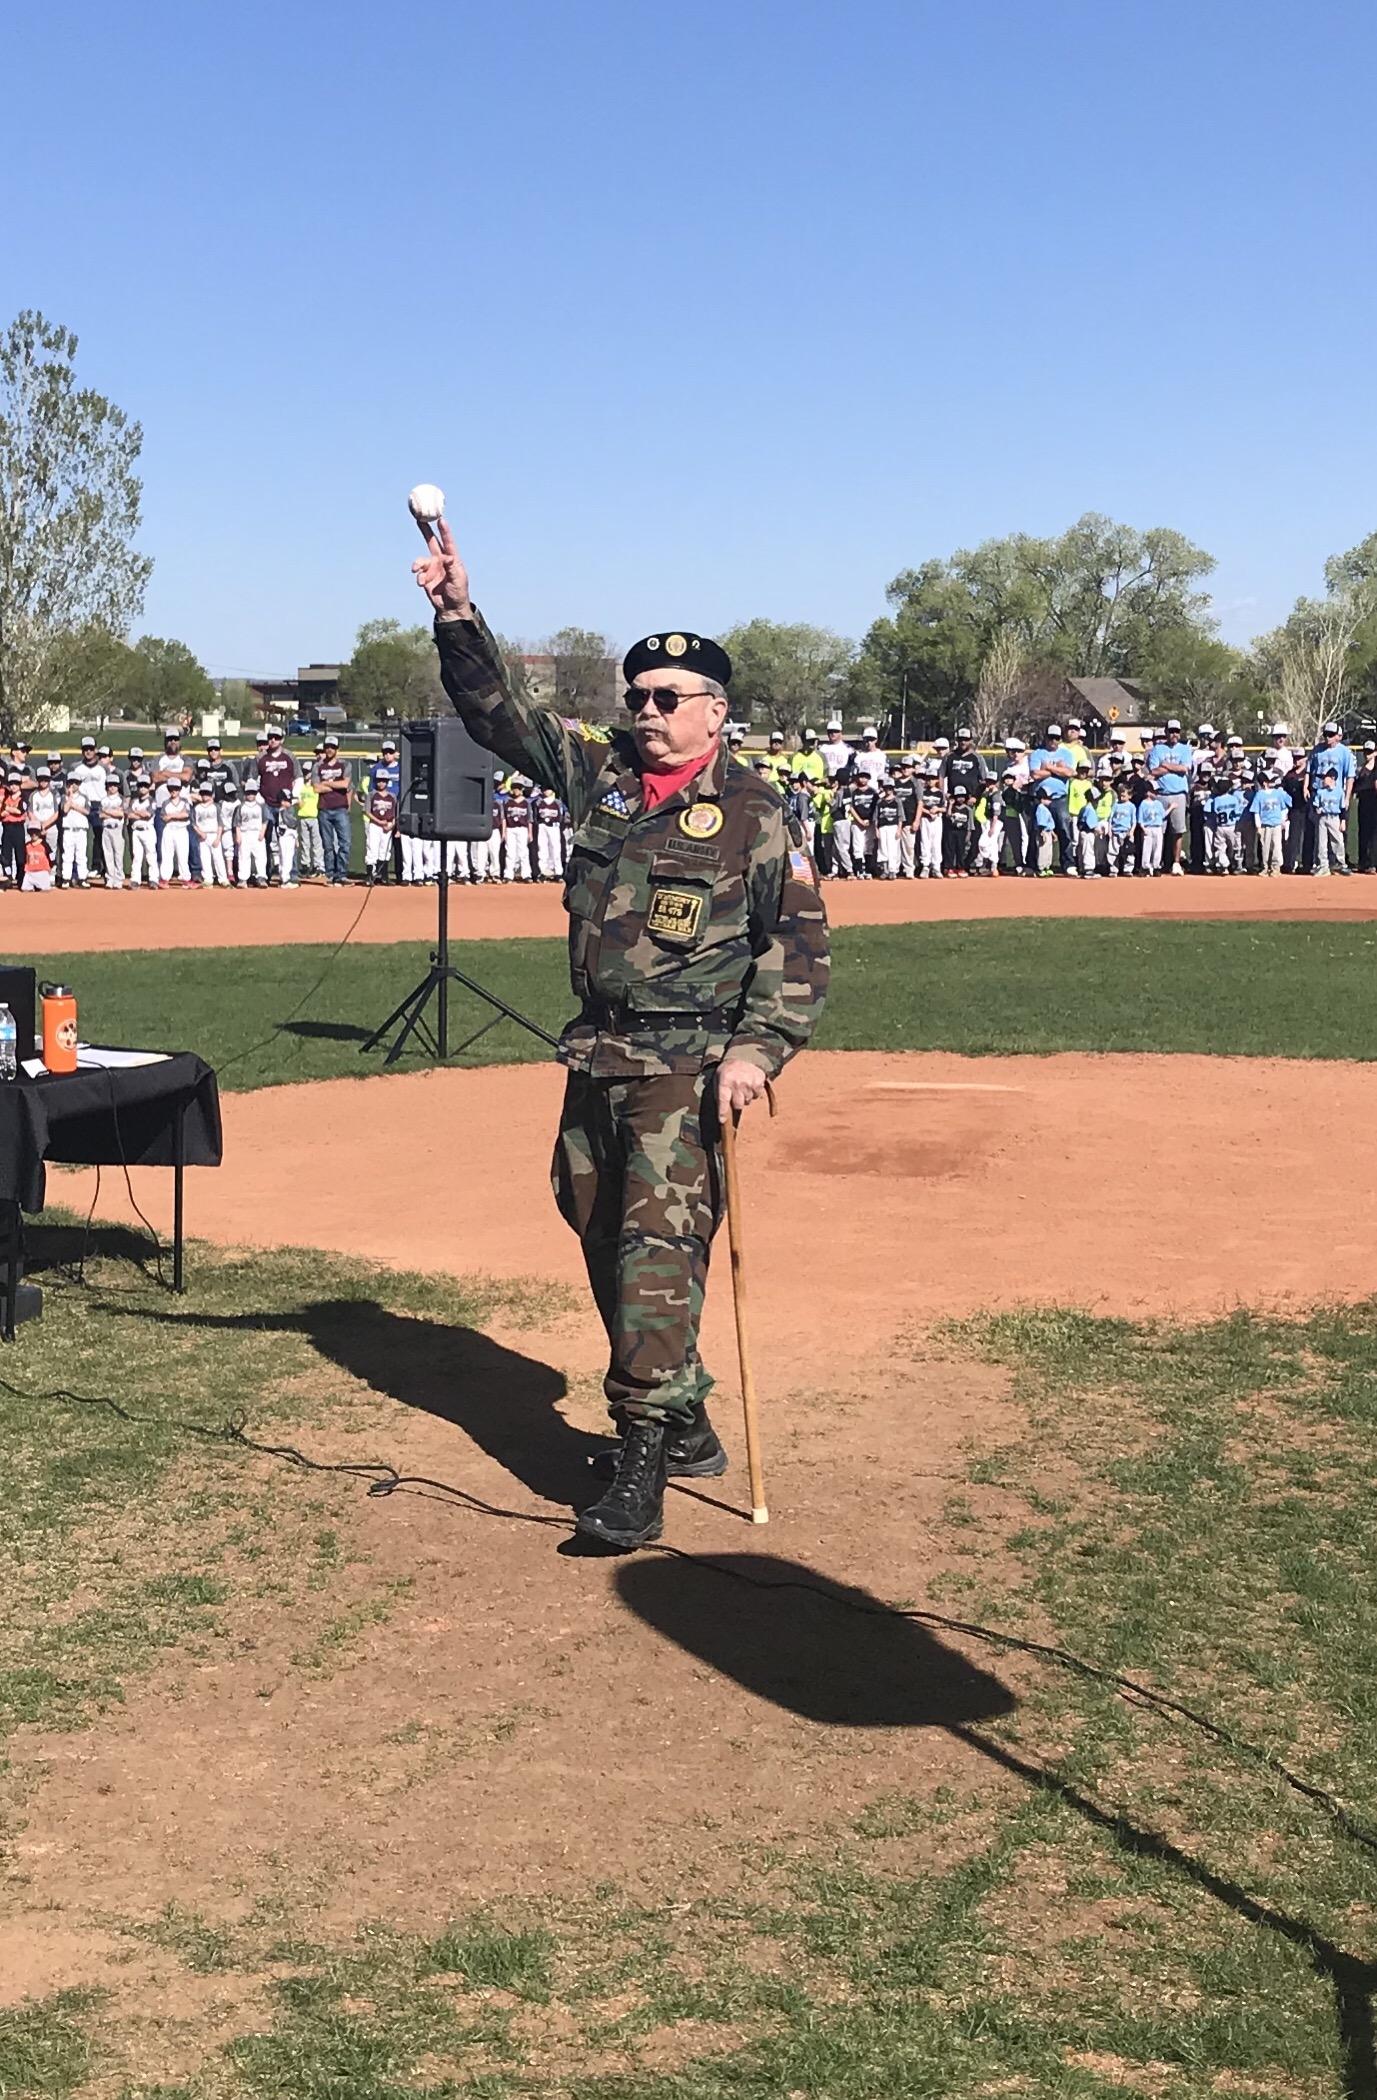 2019 CALB Cortez Legion C Pre-Season Opening Ceremonies